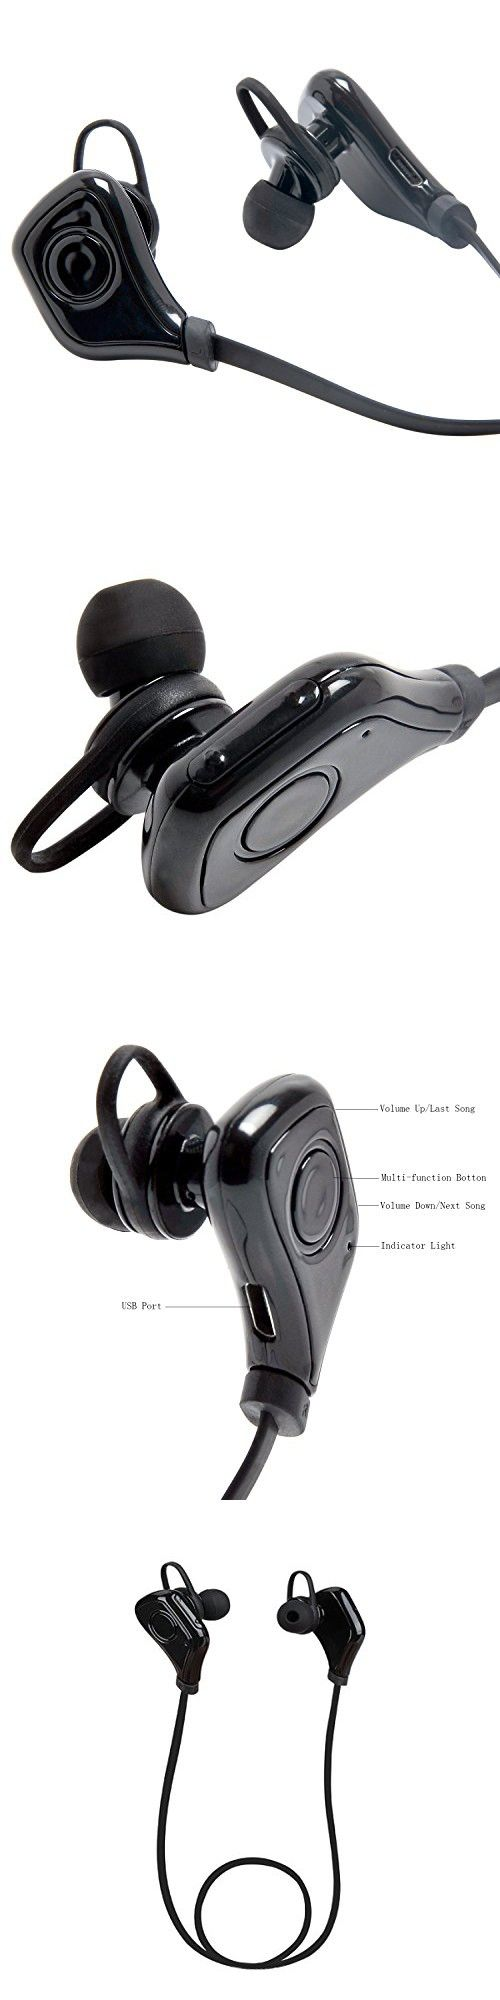 best 20 earbuds for running ideas on pinterest 10k runs near me running and long runs. Black Bedroom Furniture Sets. Home Design Ideas